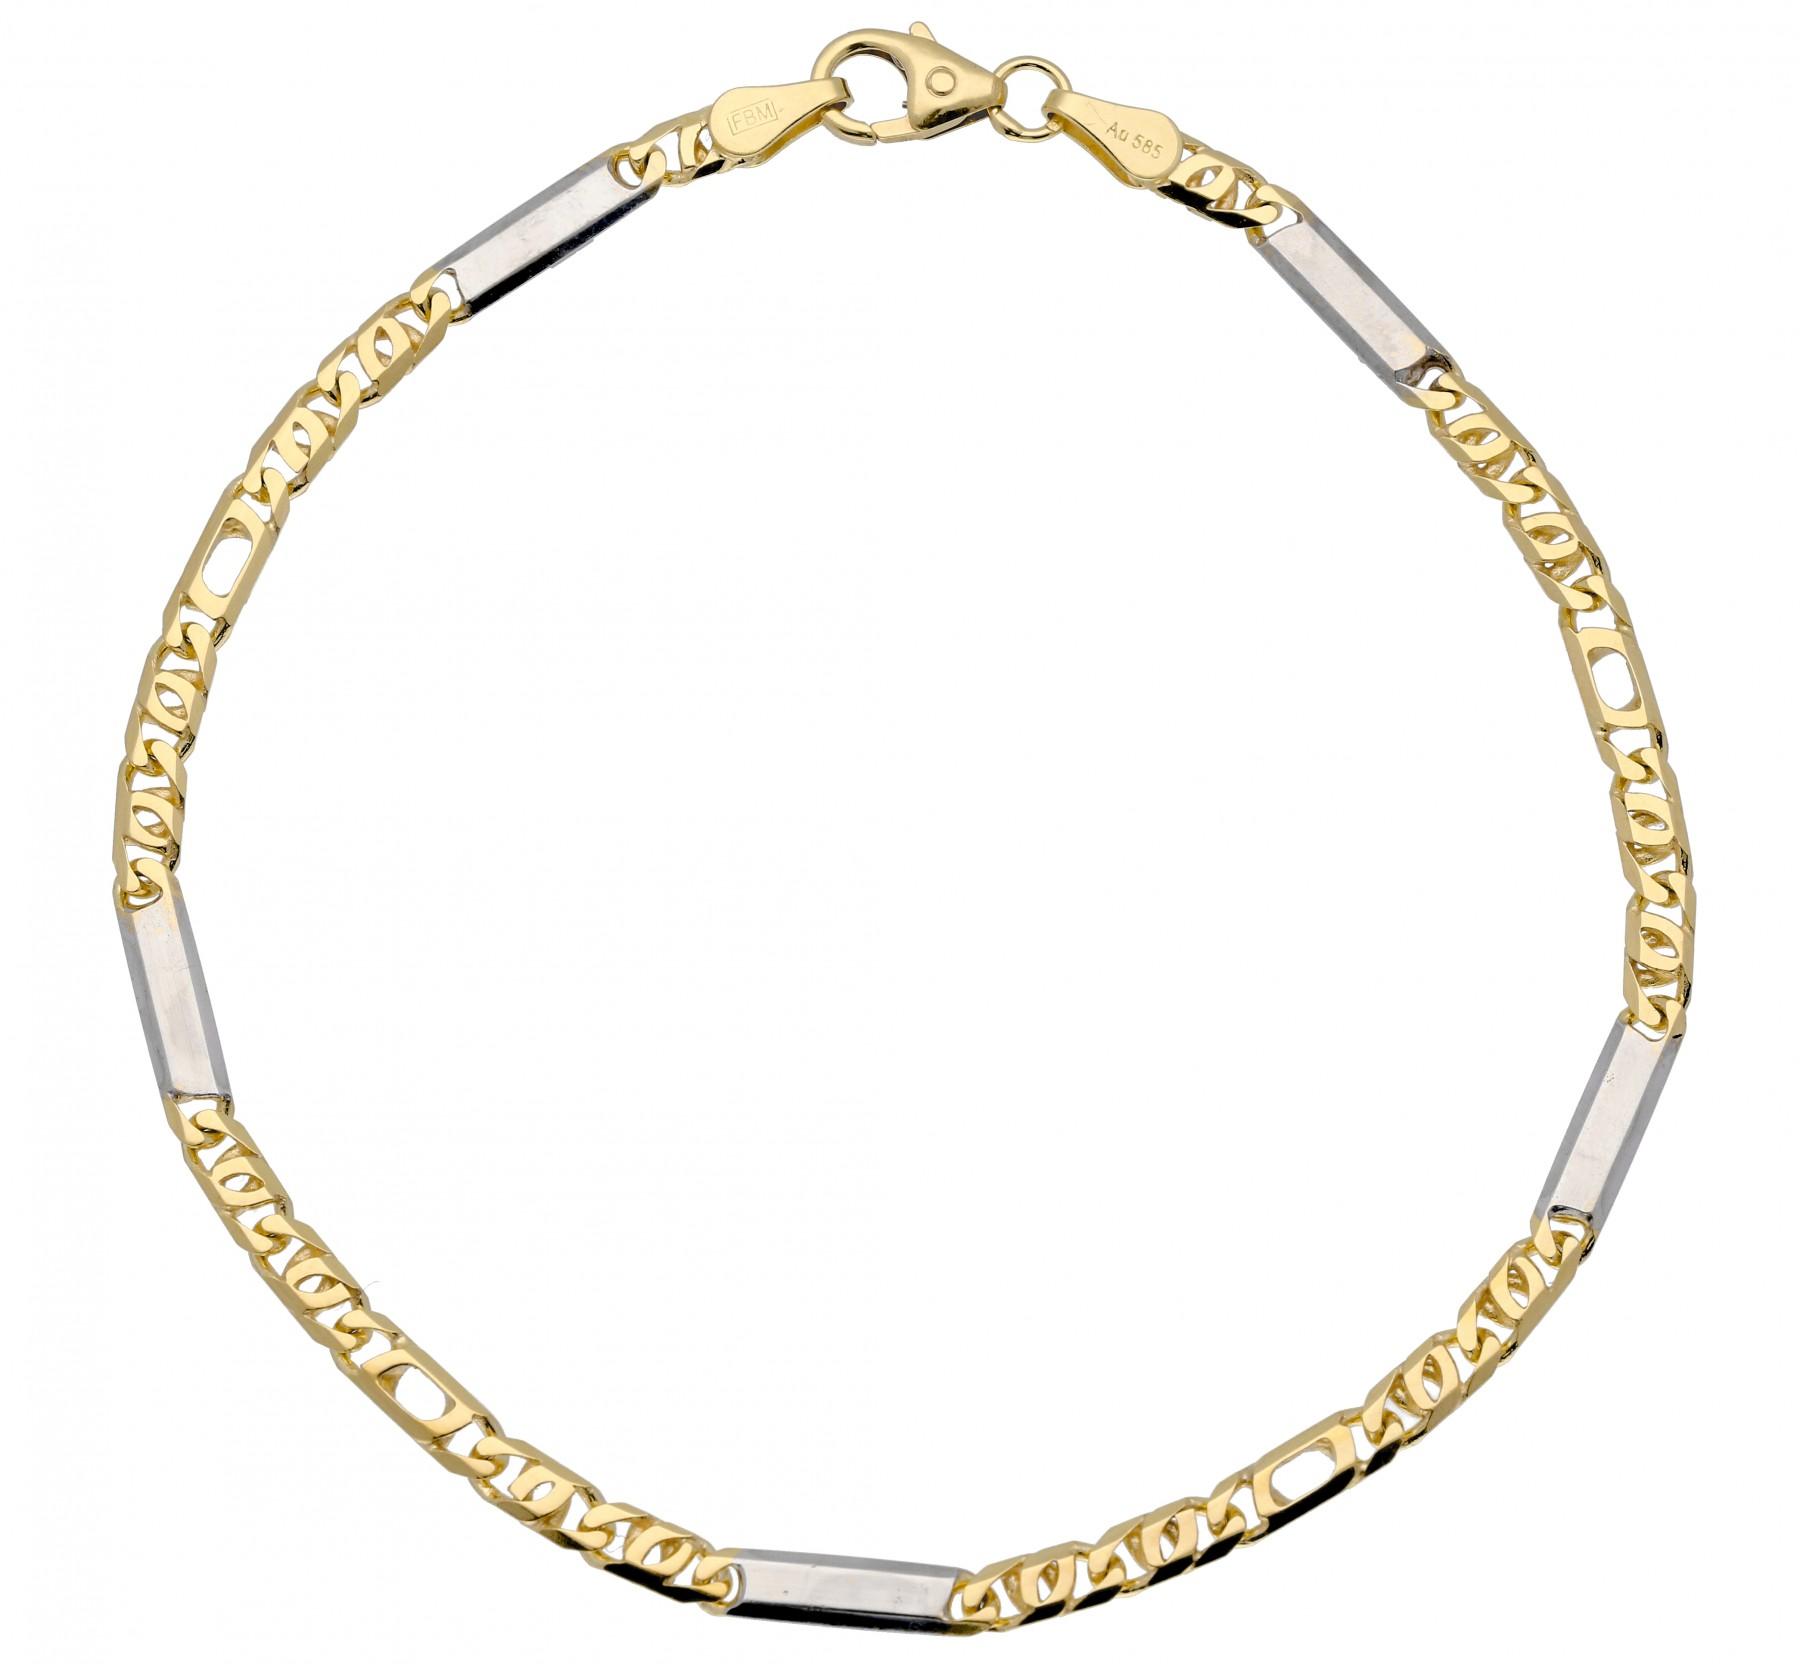 Gouden schakelarmband gold collection 19 cm - valkenoog schakel - 3 mm breed 204.5038.19